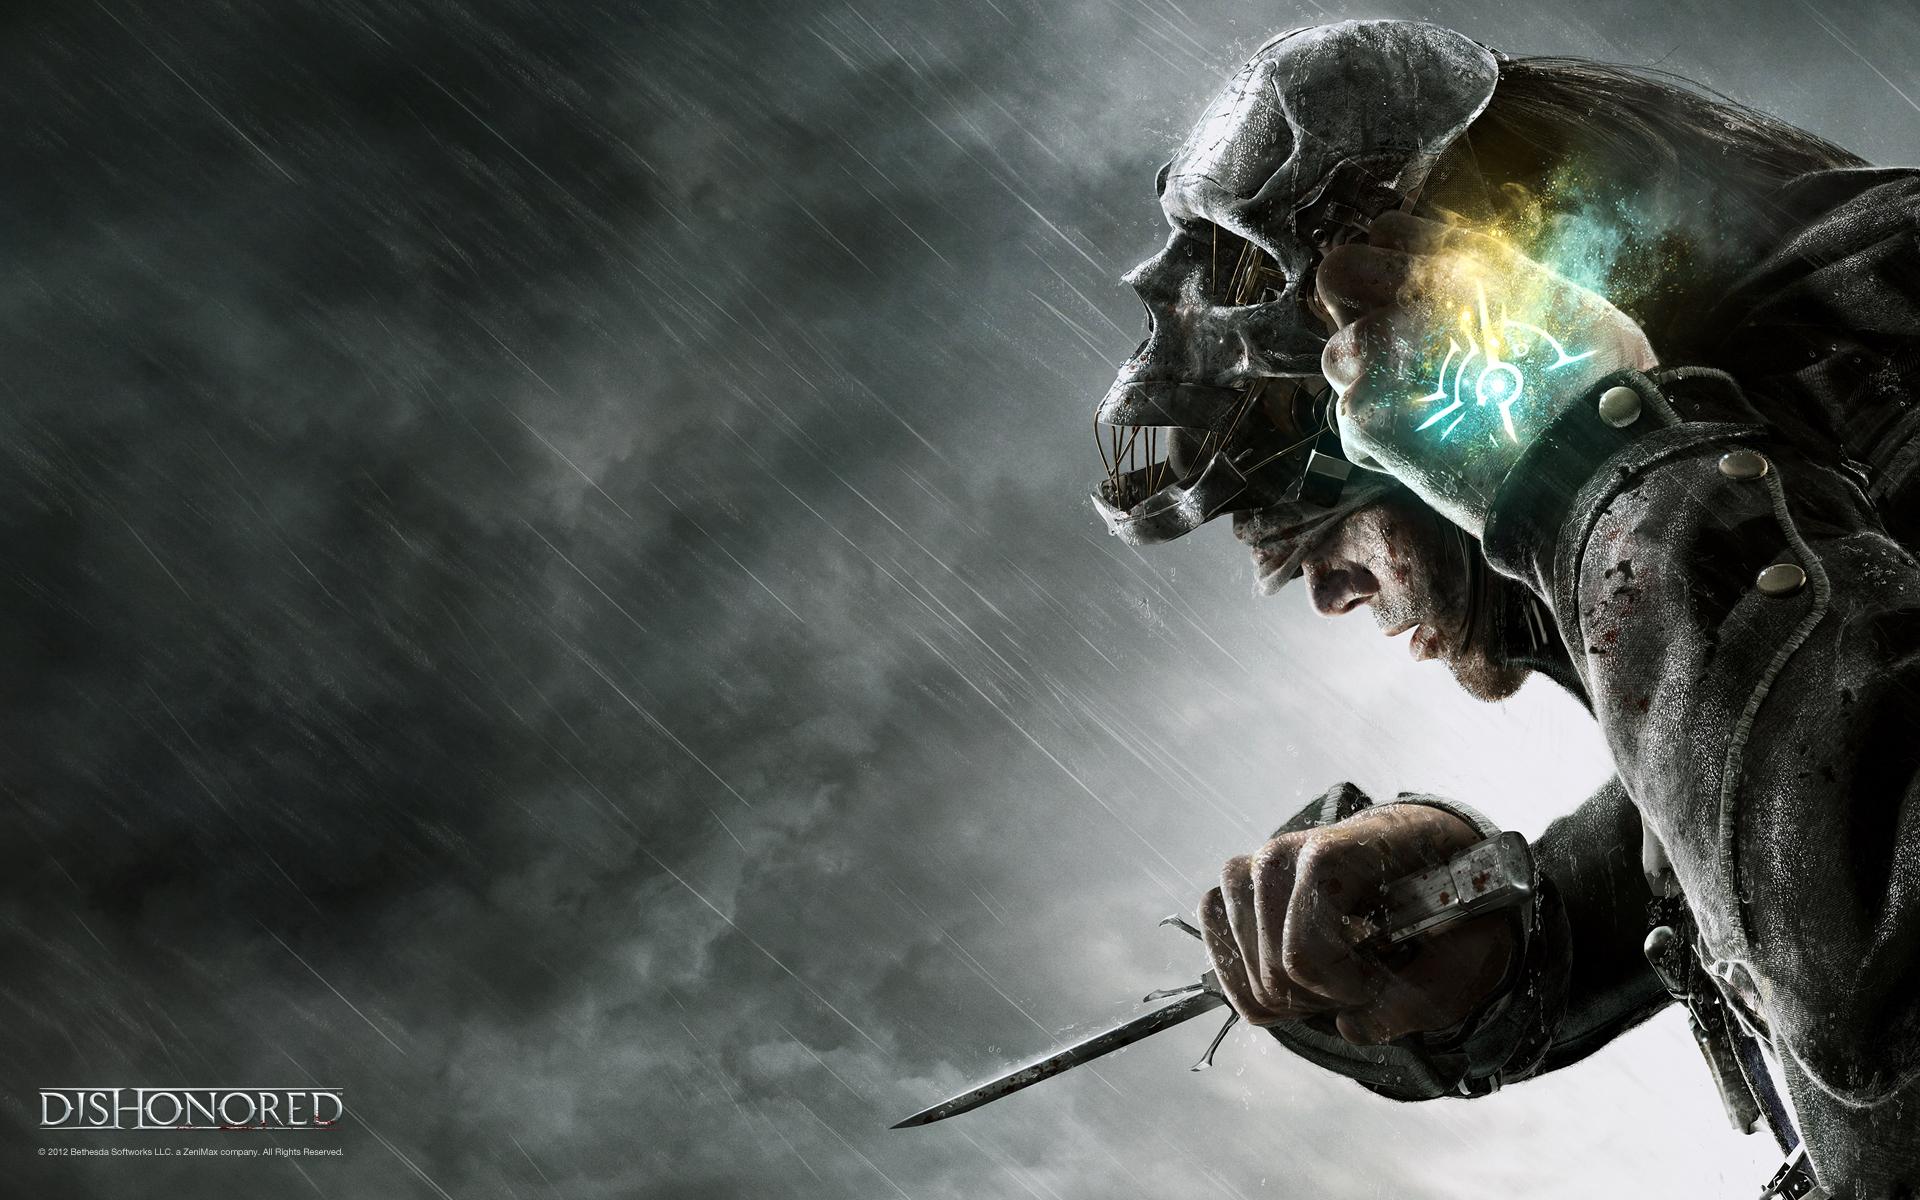 dishonoured game